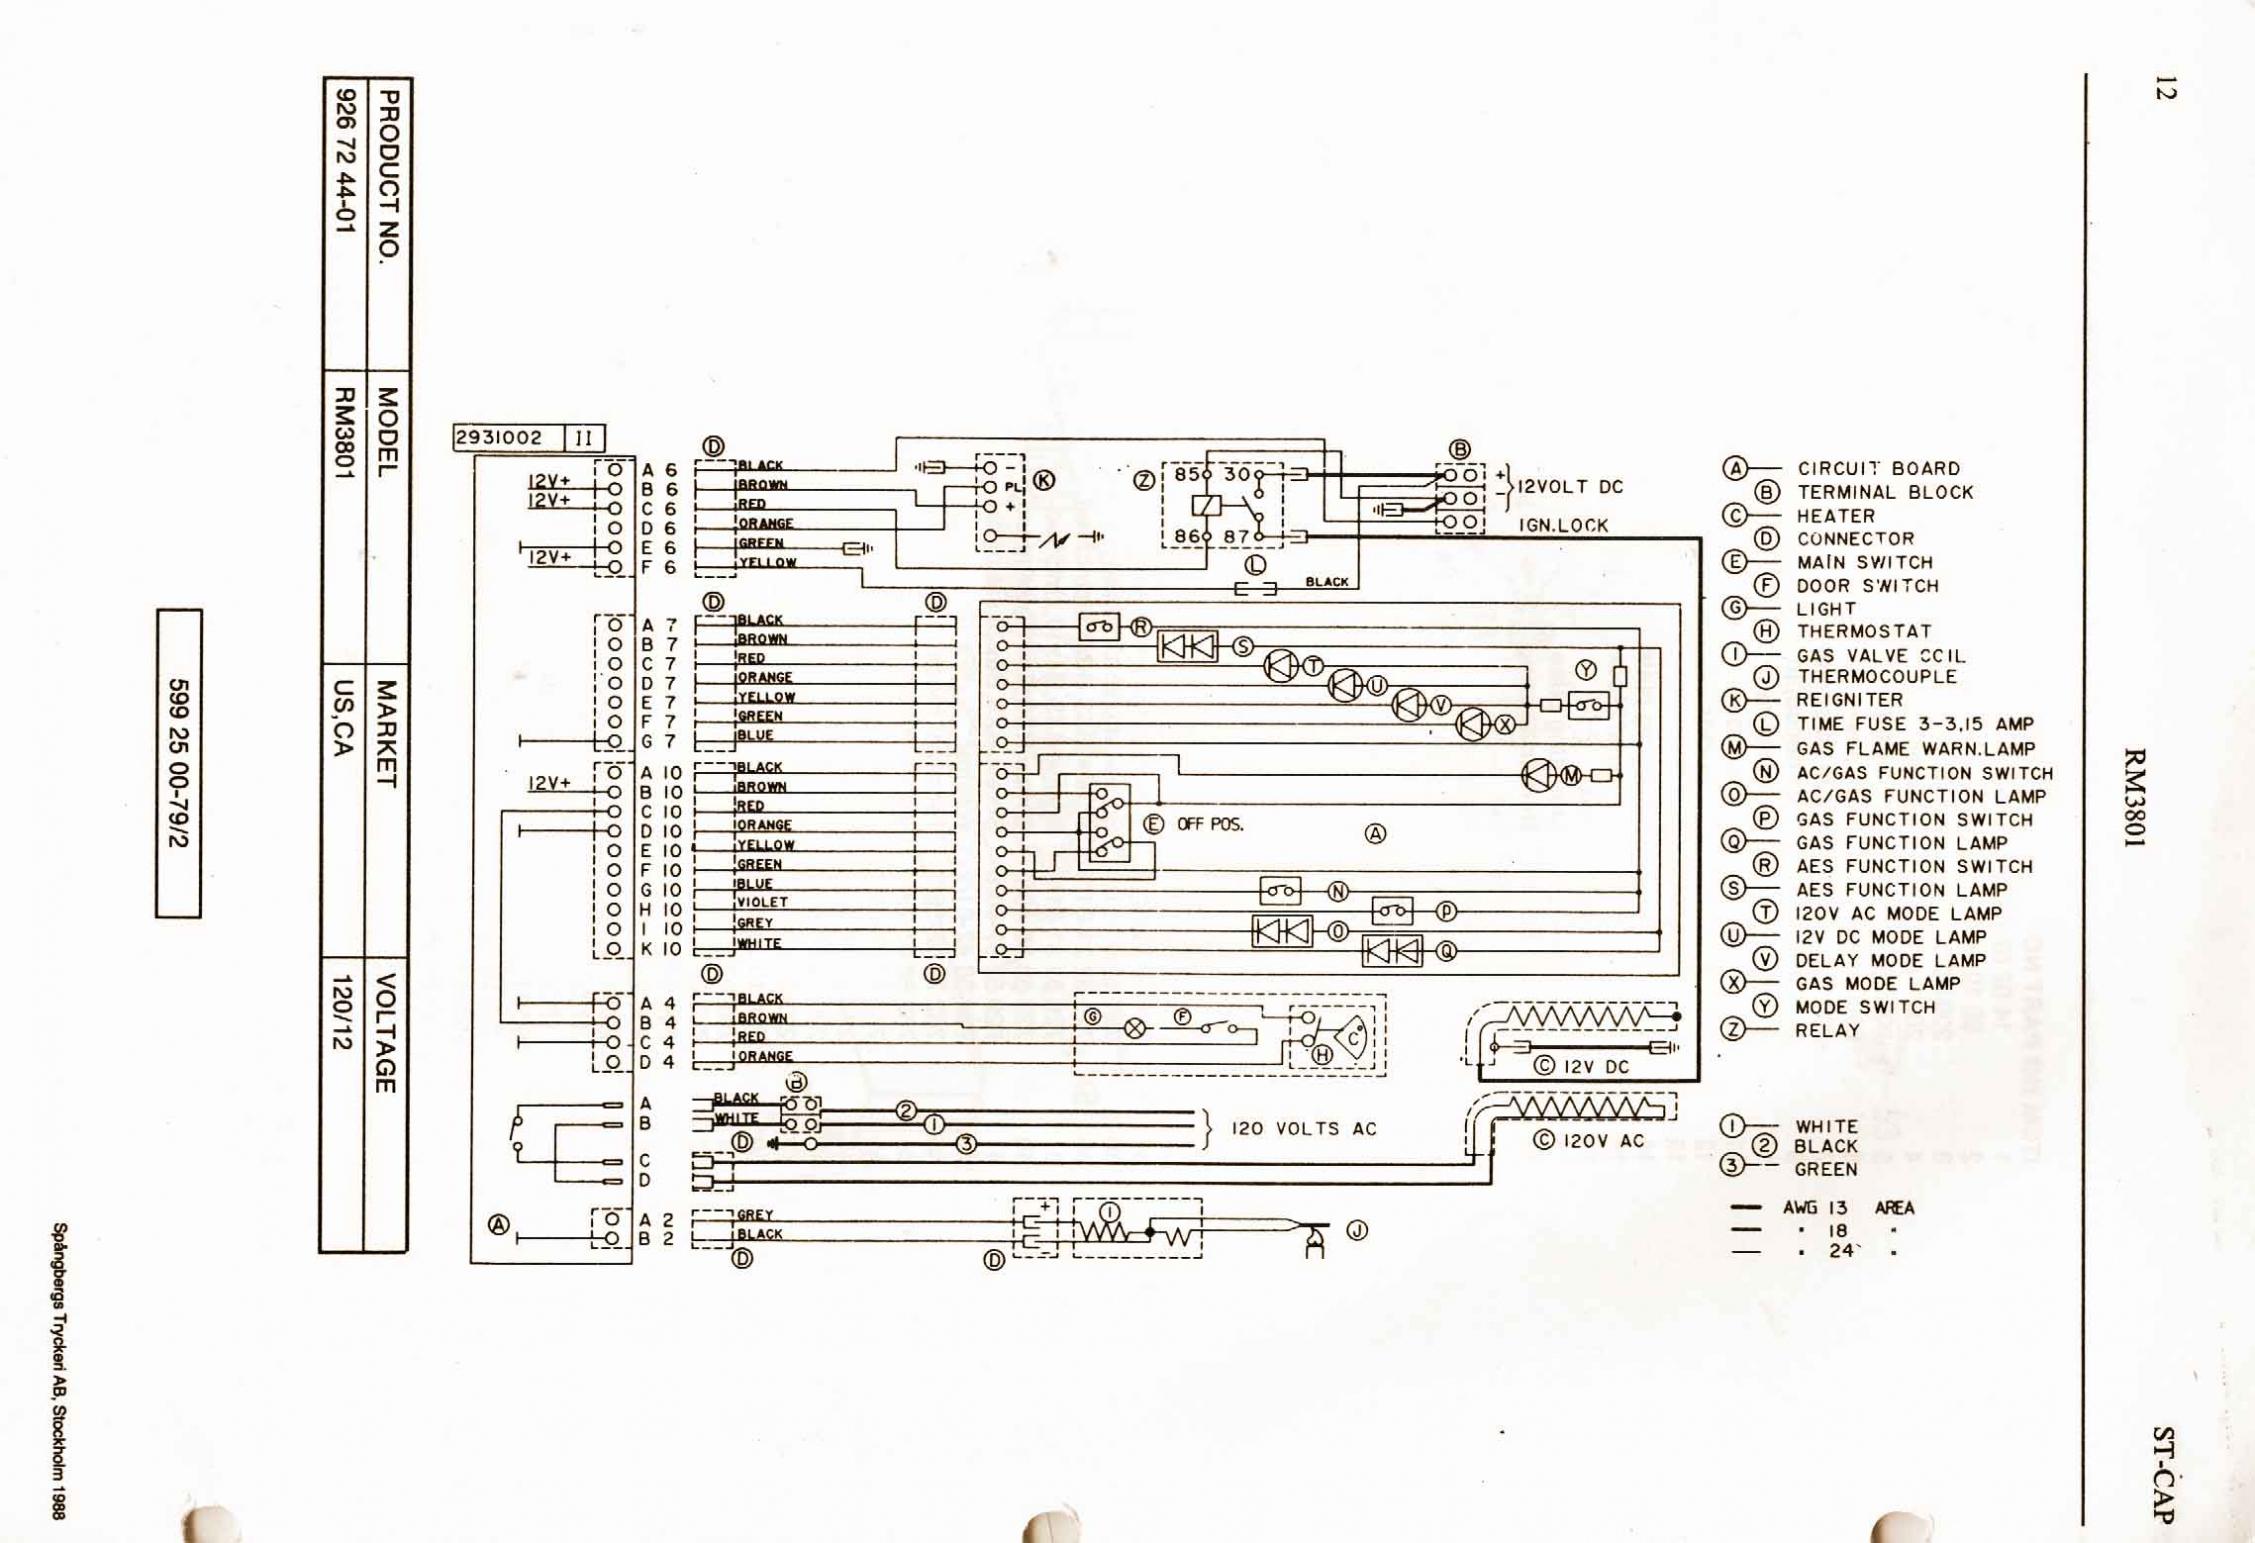 Dometic Rv Thermostat Wiring Diagram – Dometic 3 Way Refrigerator - Rv Thermostat Wiring Diagram